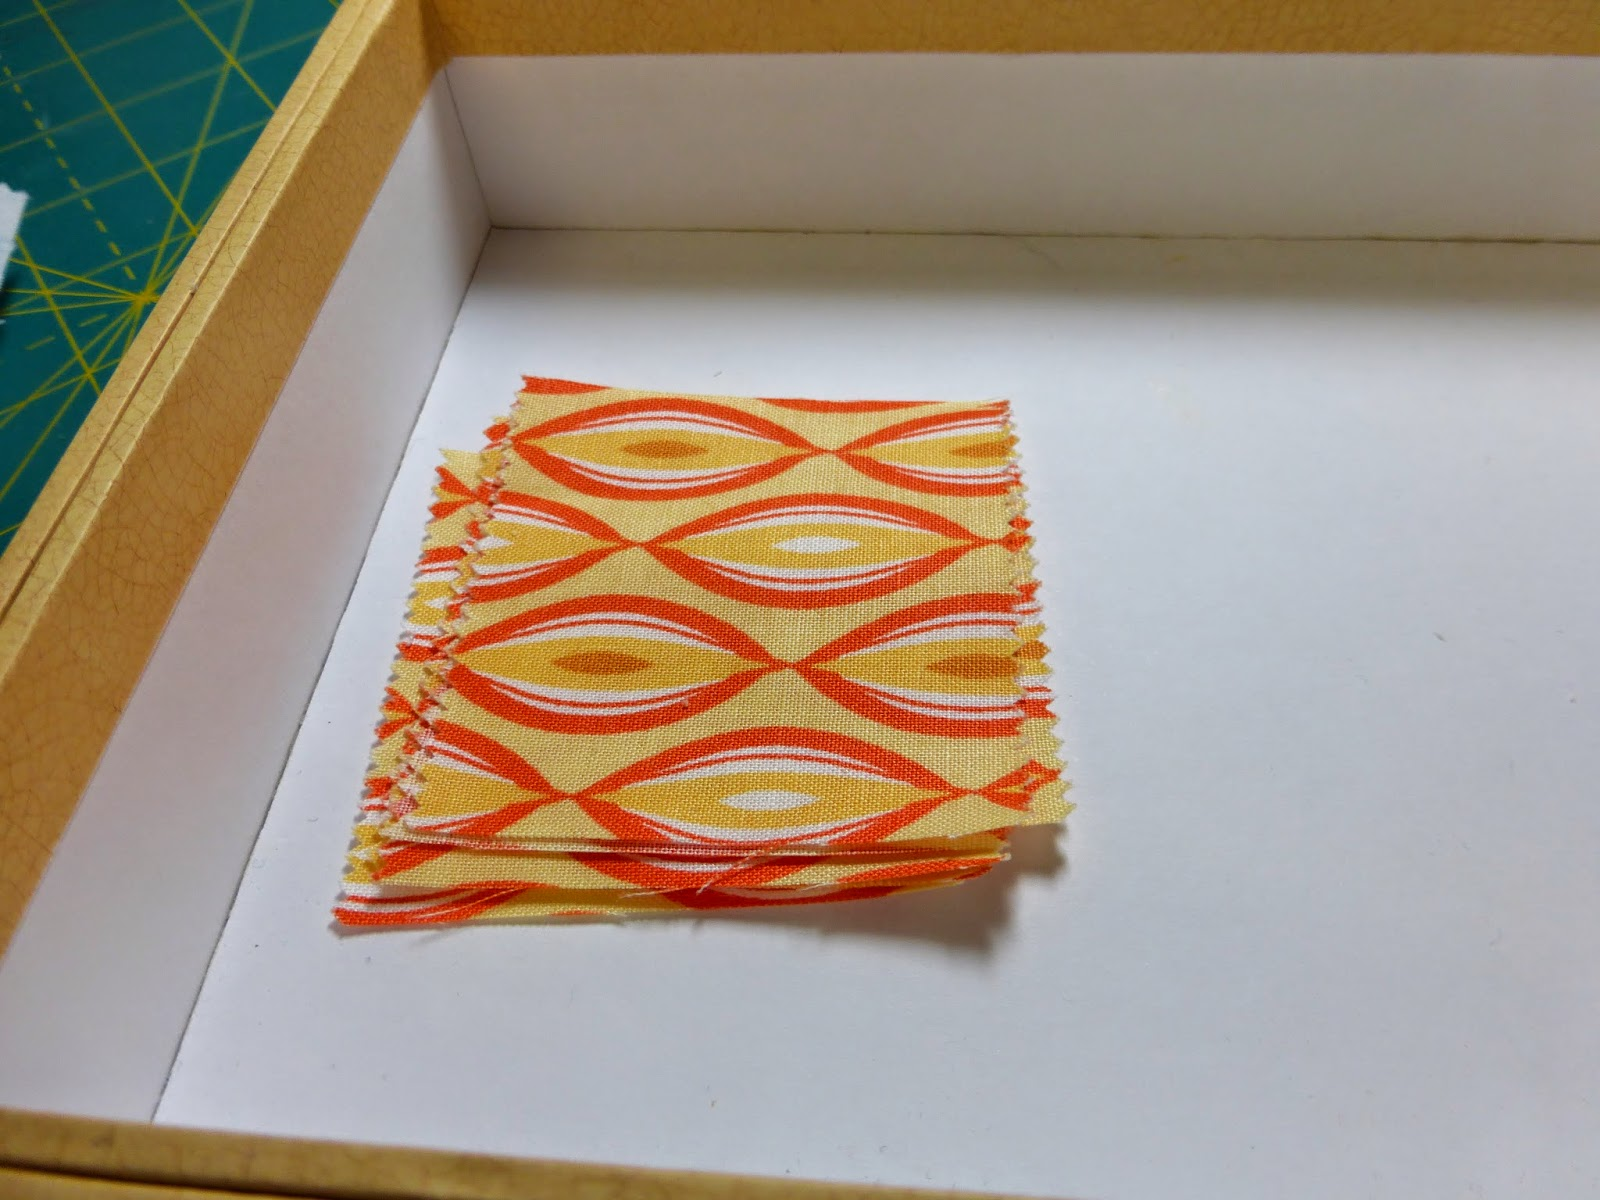 In Sewtopia Testing Decorative Stitches And Little Blocks